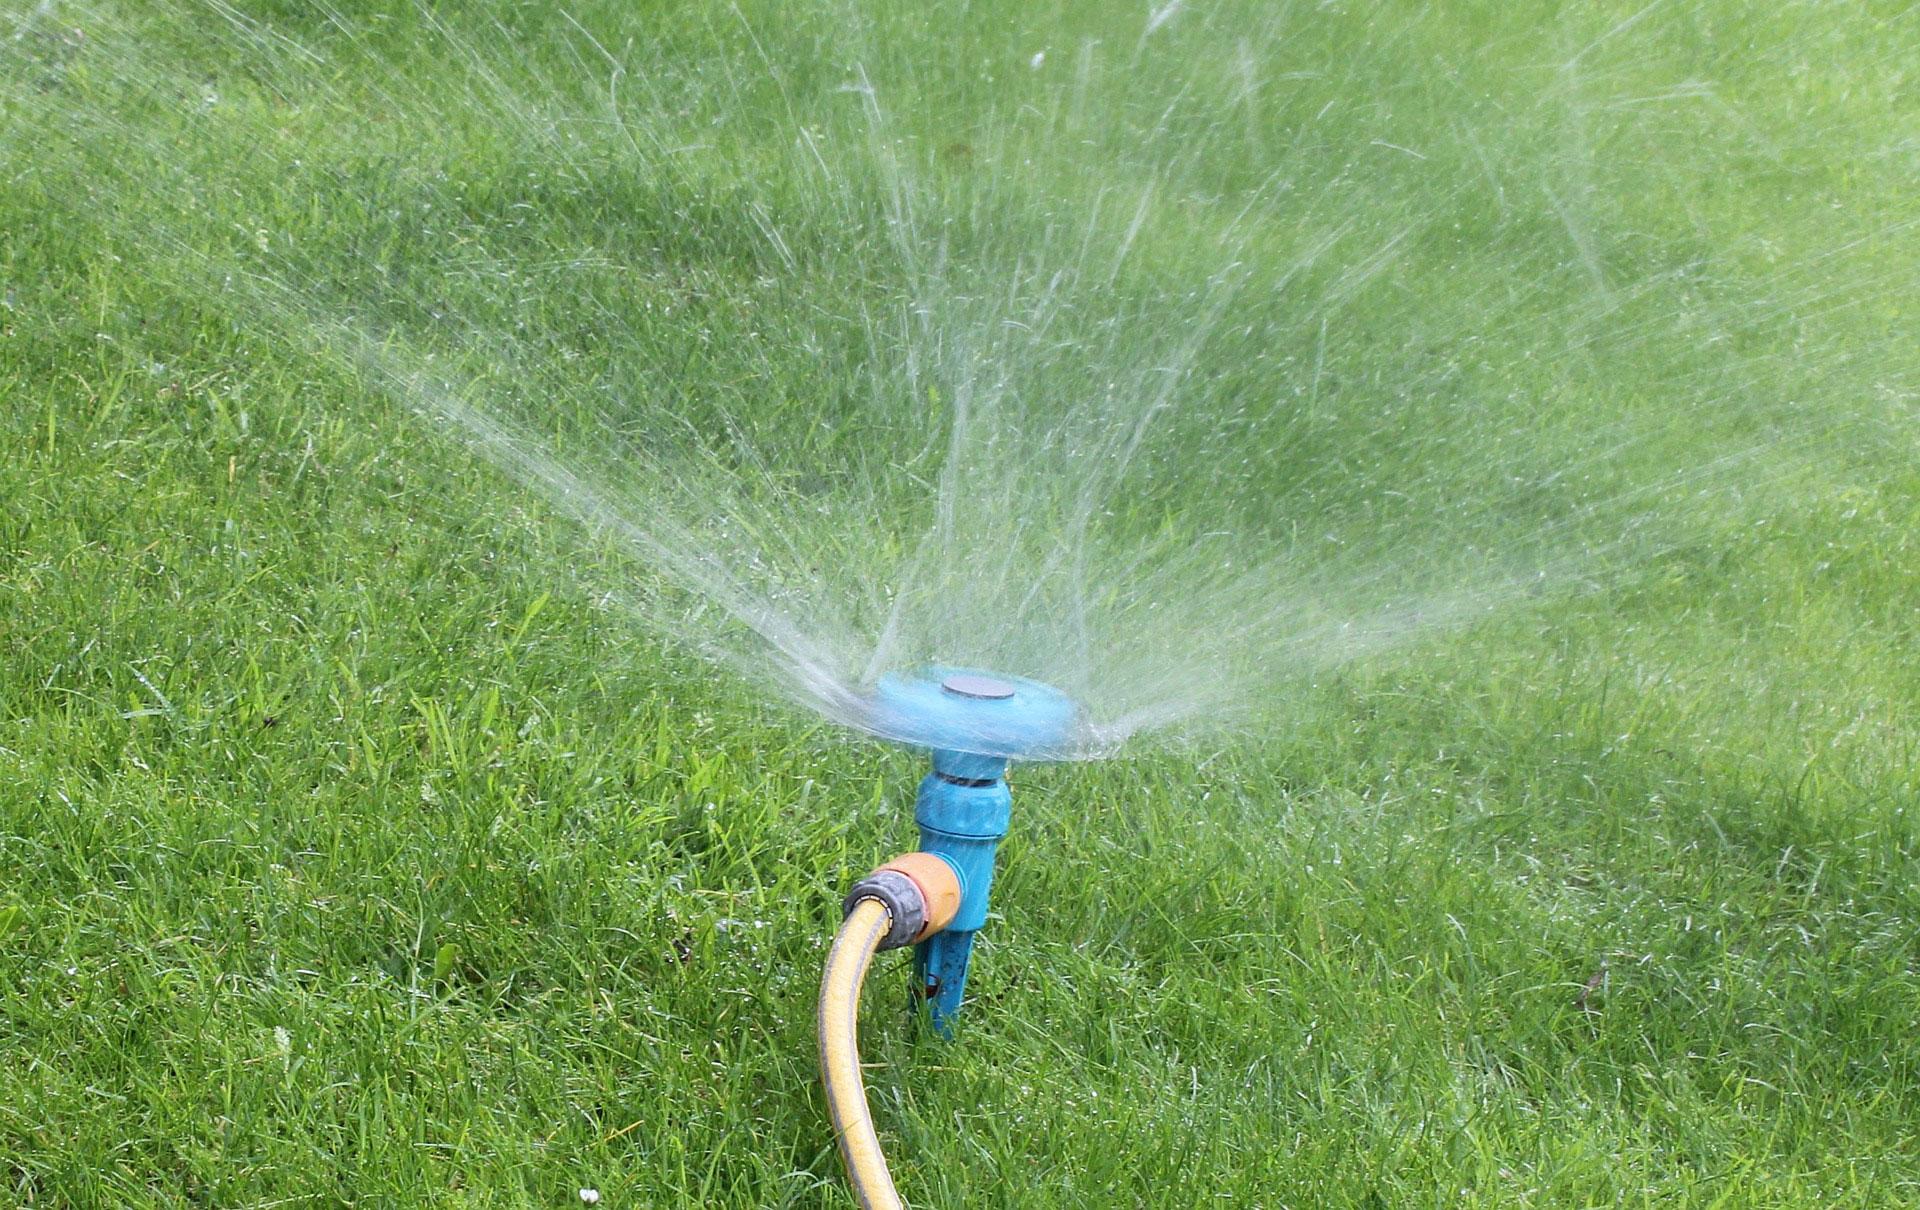 Lawn grass sprinkler